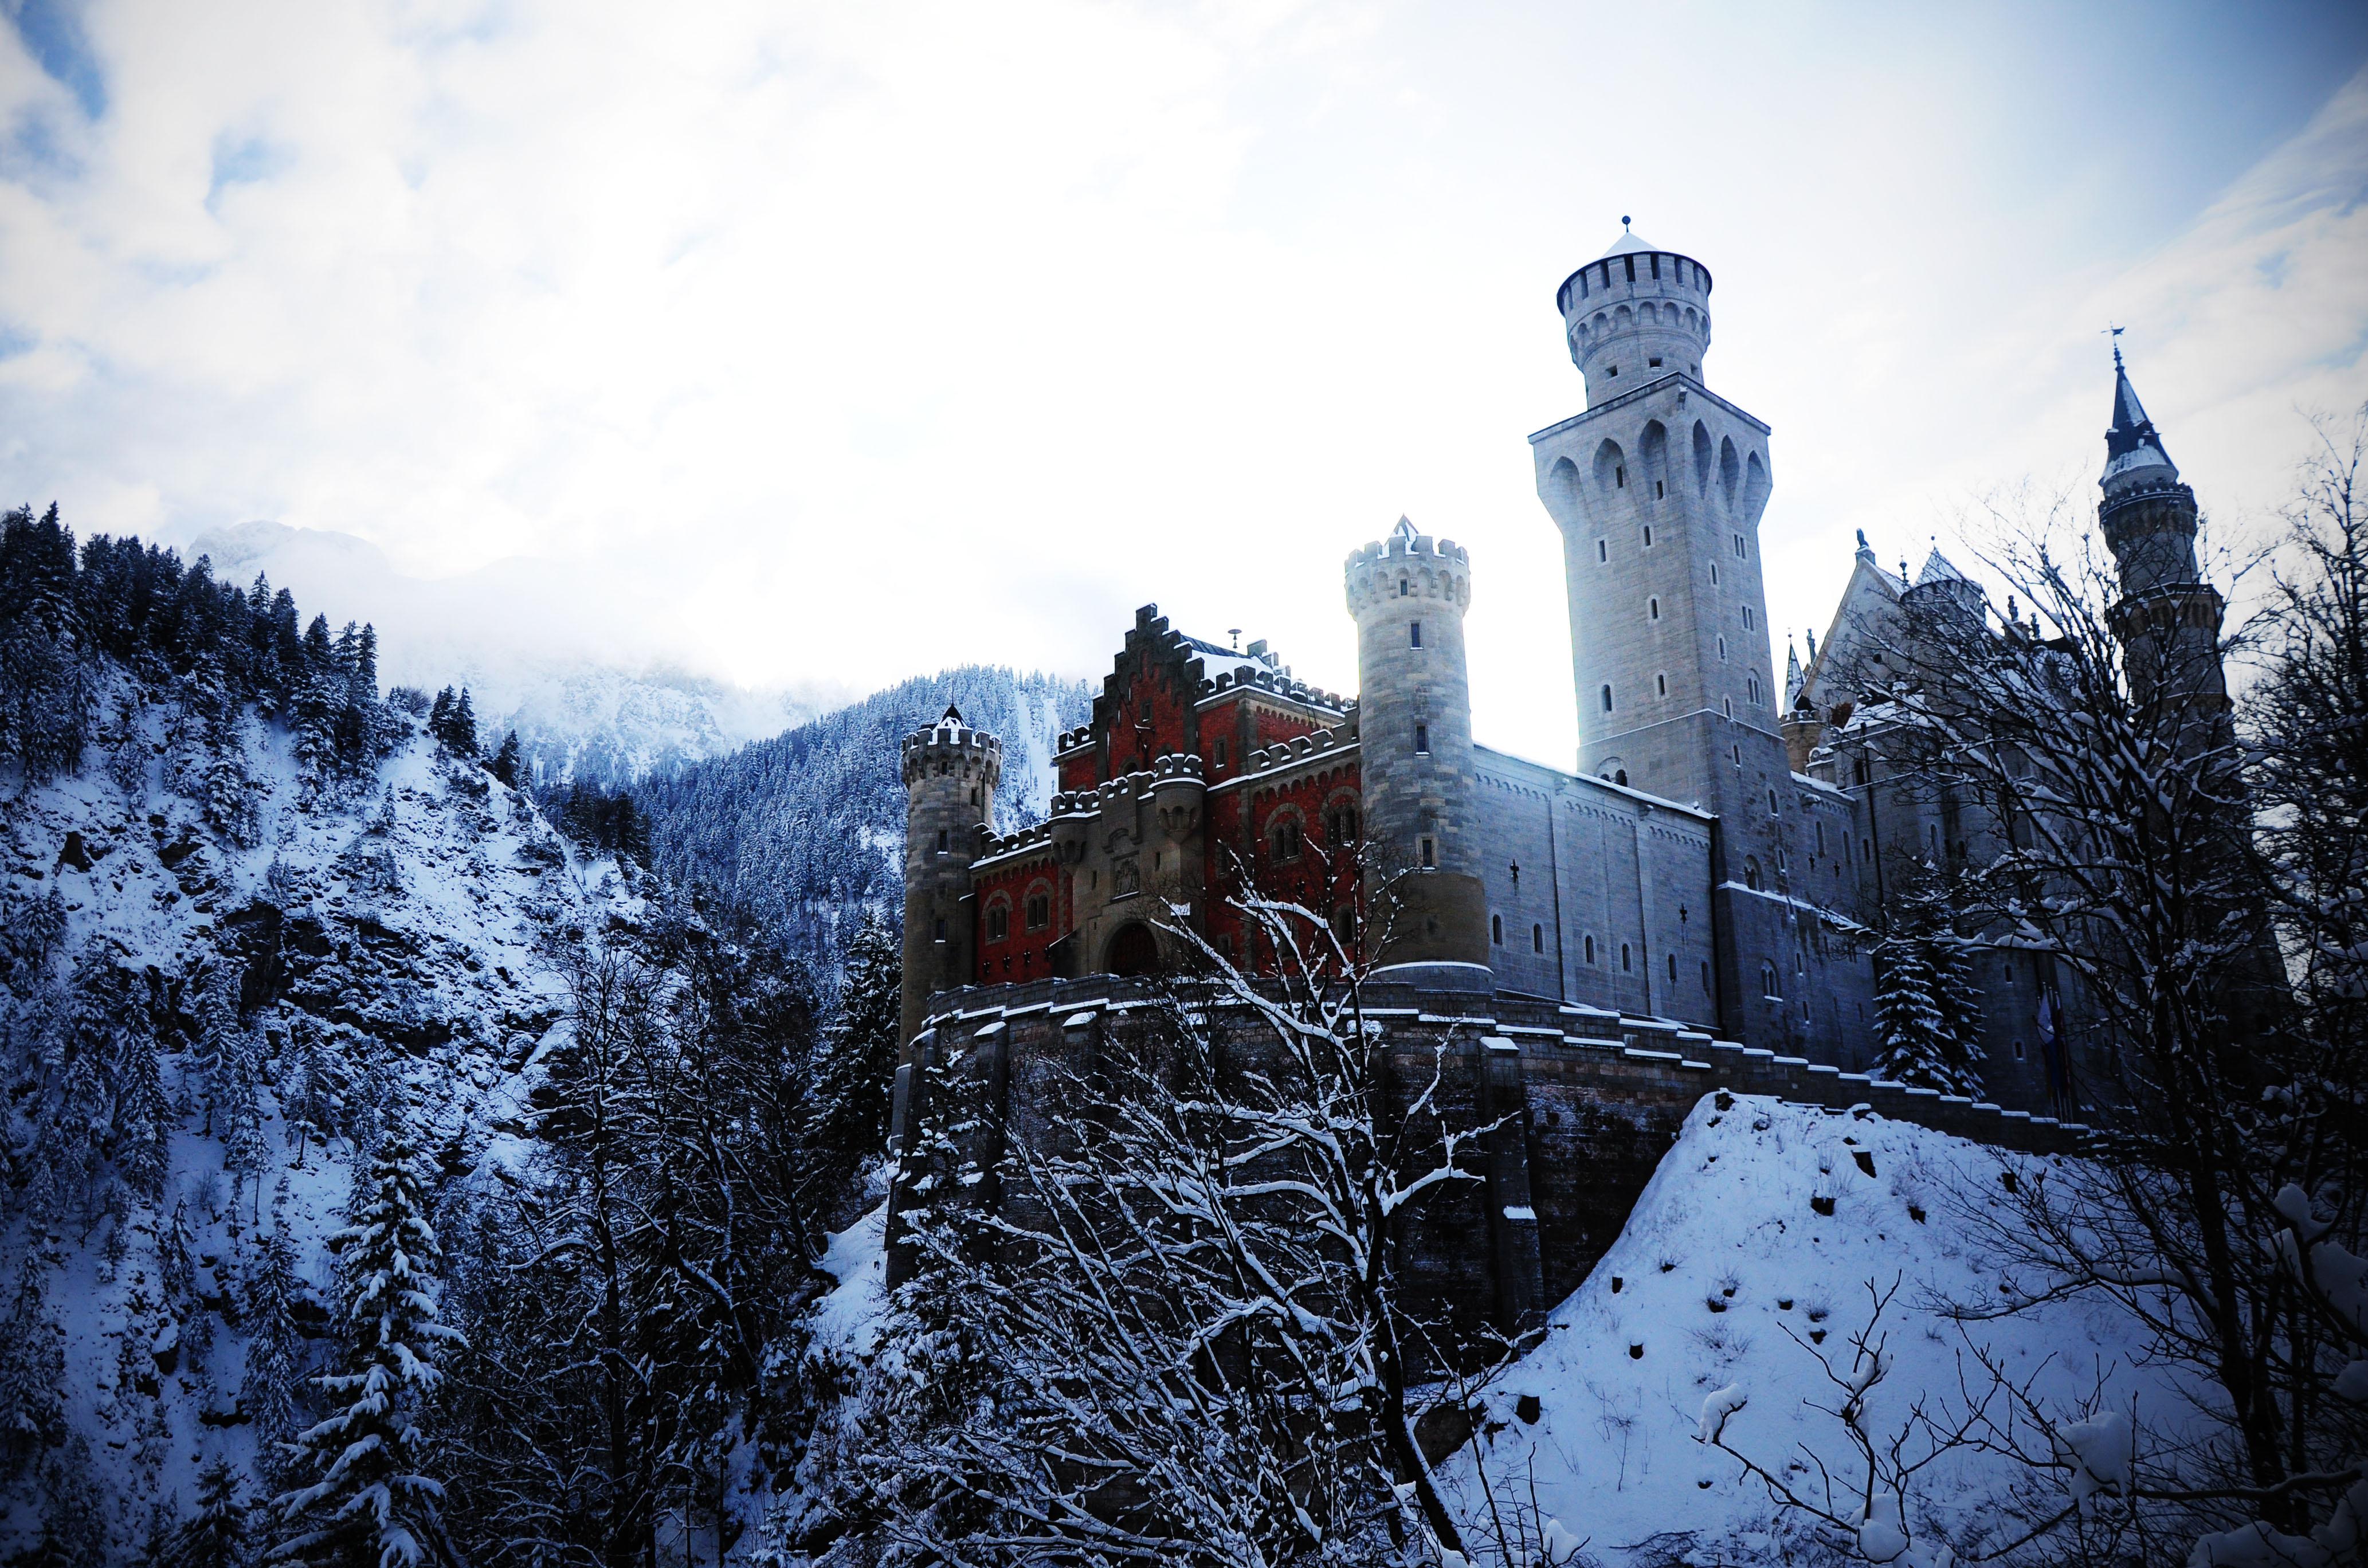 Wallpaper germany bavaria neuschwanstein castle treasure alps 4132x2736